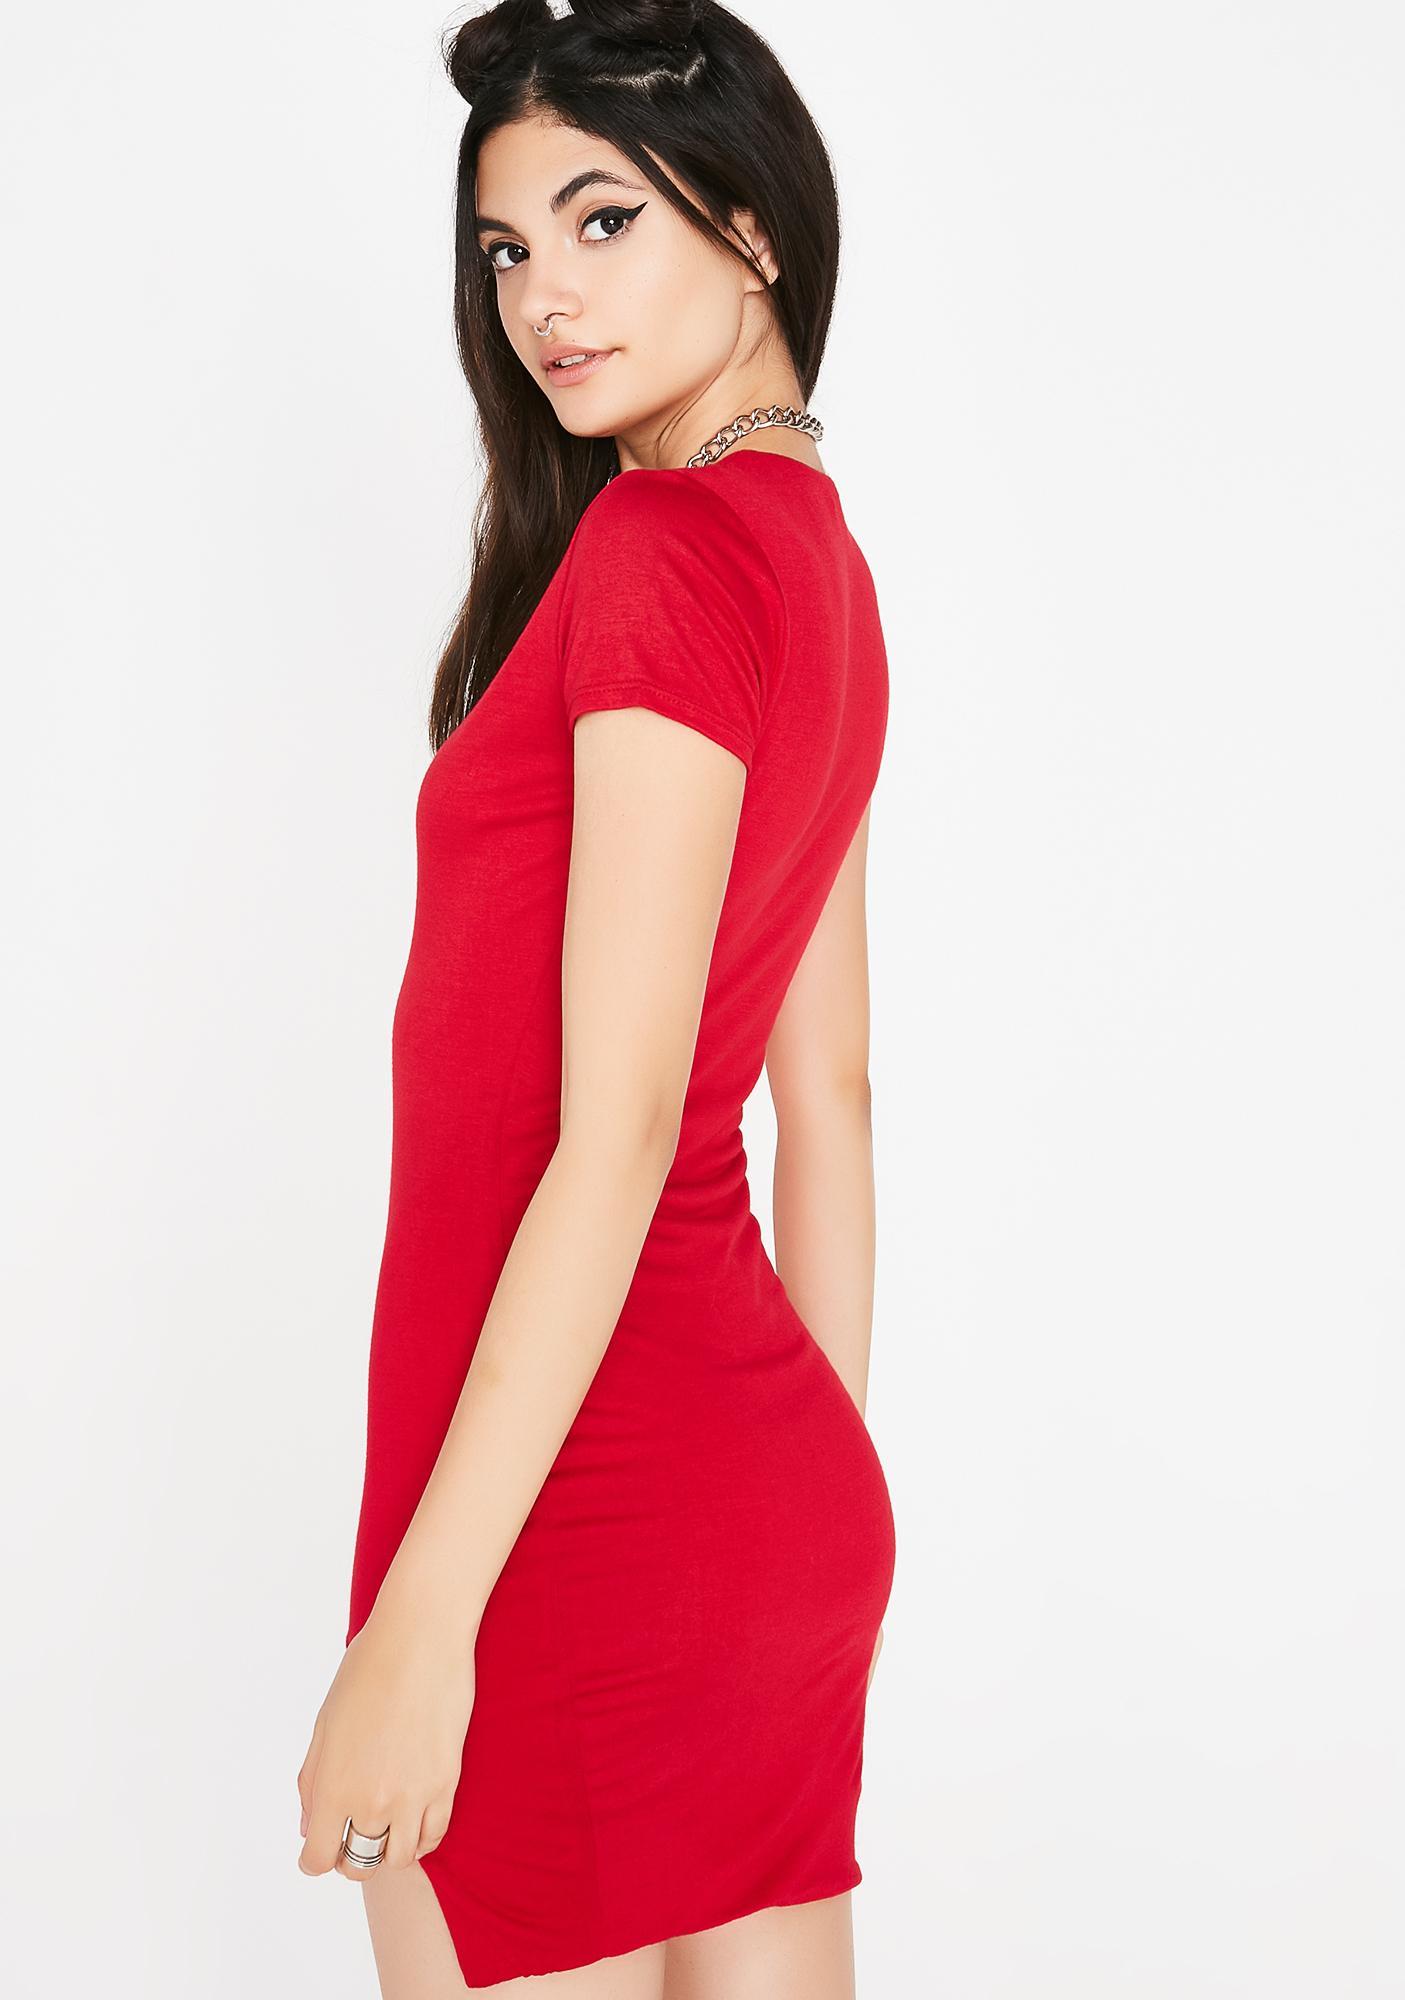 Spicy Arm Candy Mini Dress